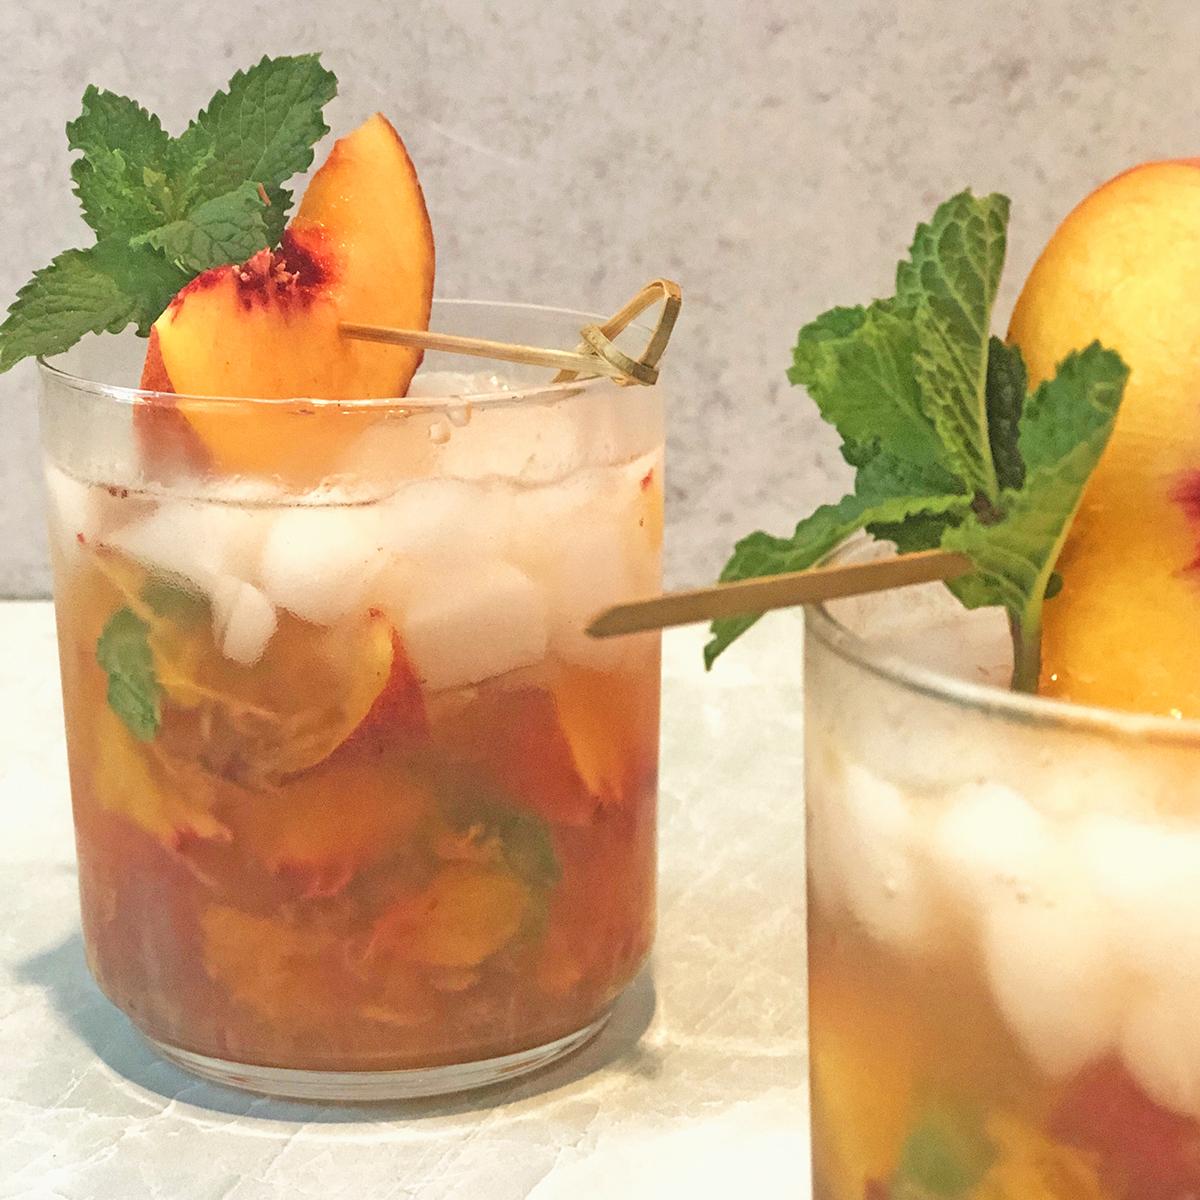 Whisky Peach Smash